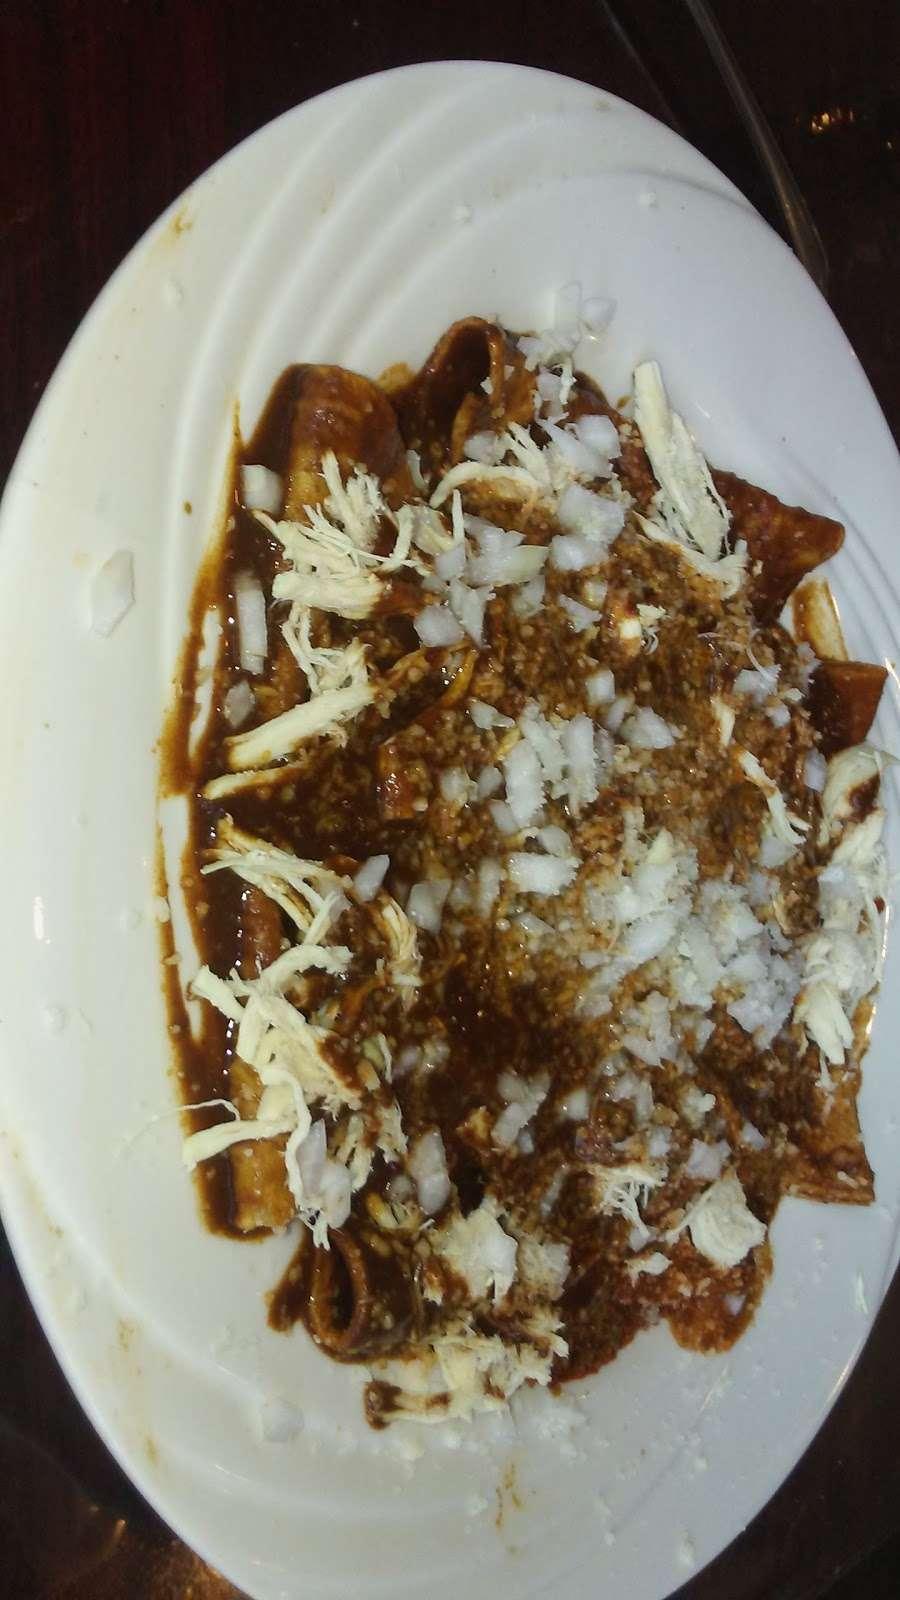 Nonna Lisa Pizza - restaurant  | Photo 10 of 10 | Address: 41 River Rd, North Arlington, NJ 07031, USA | Phone: (201) 885-3155